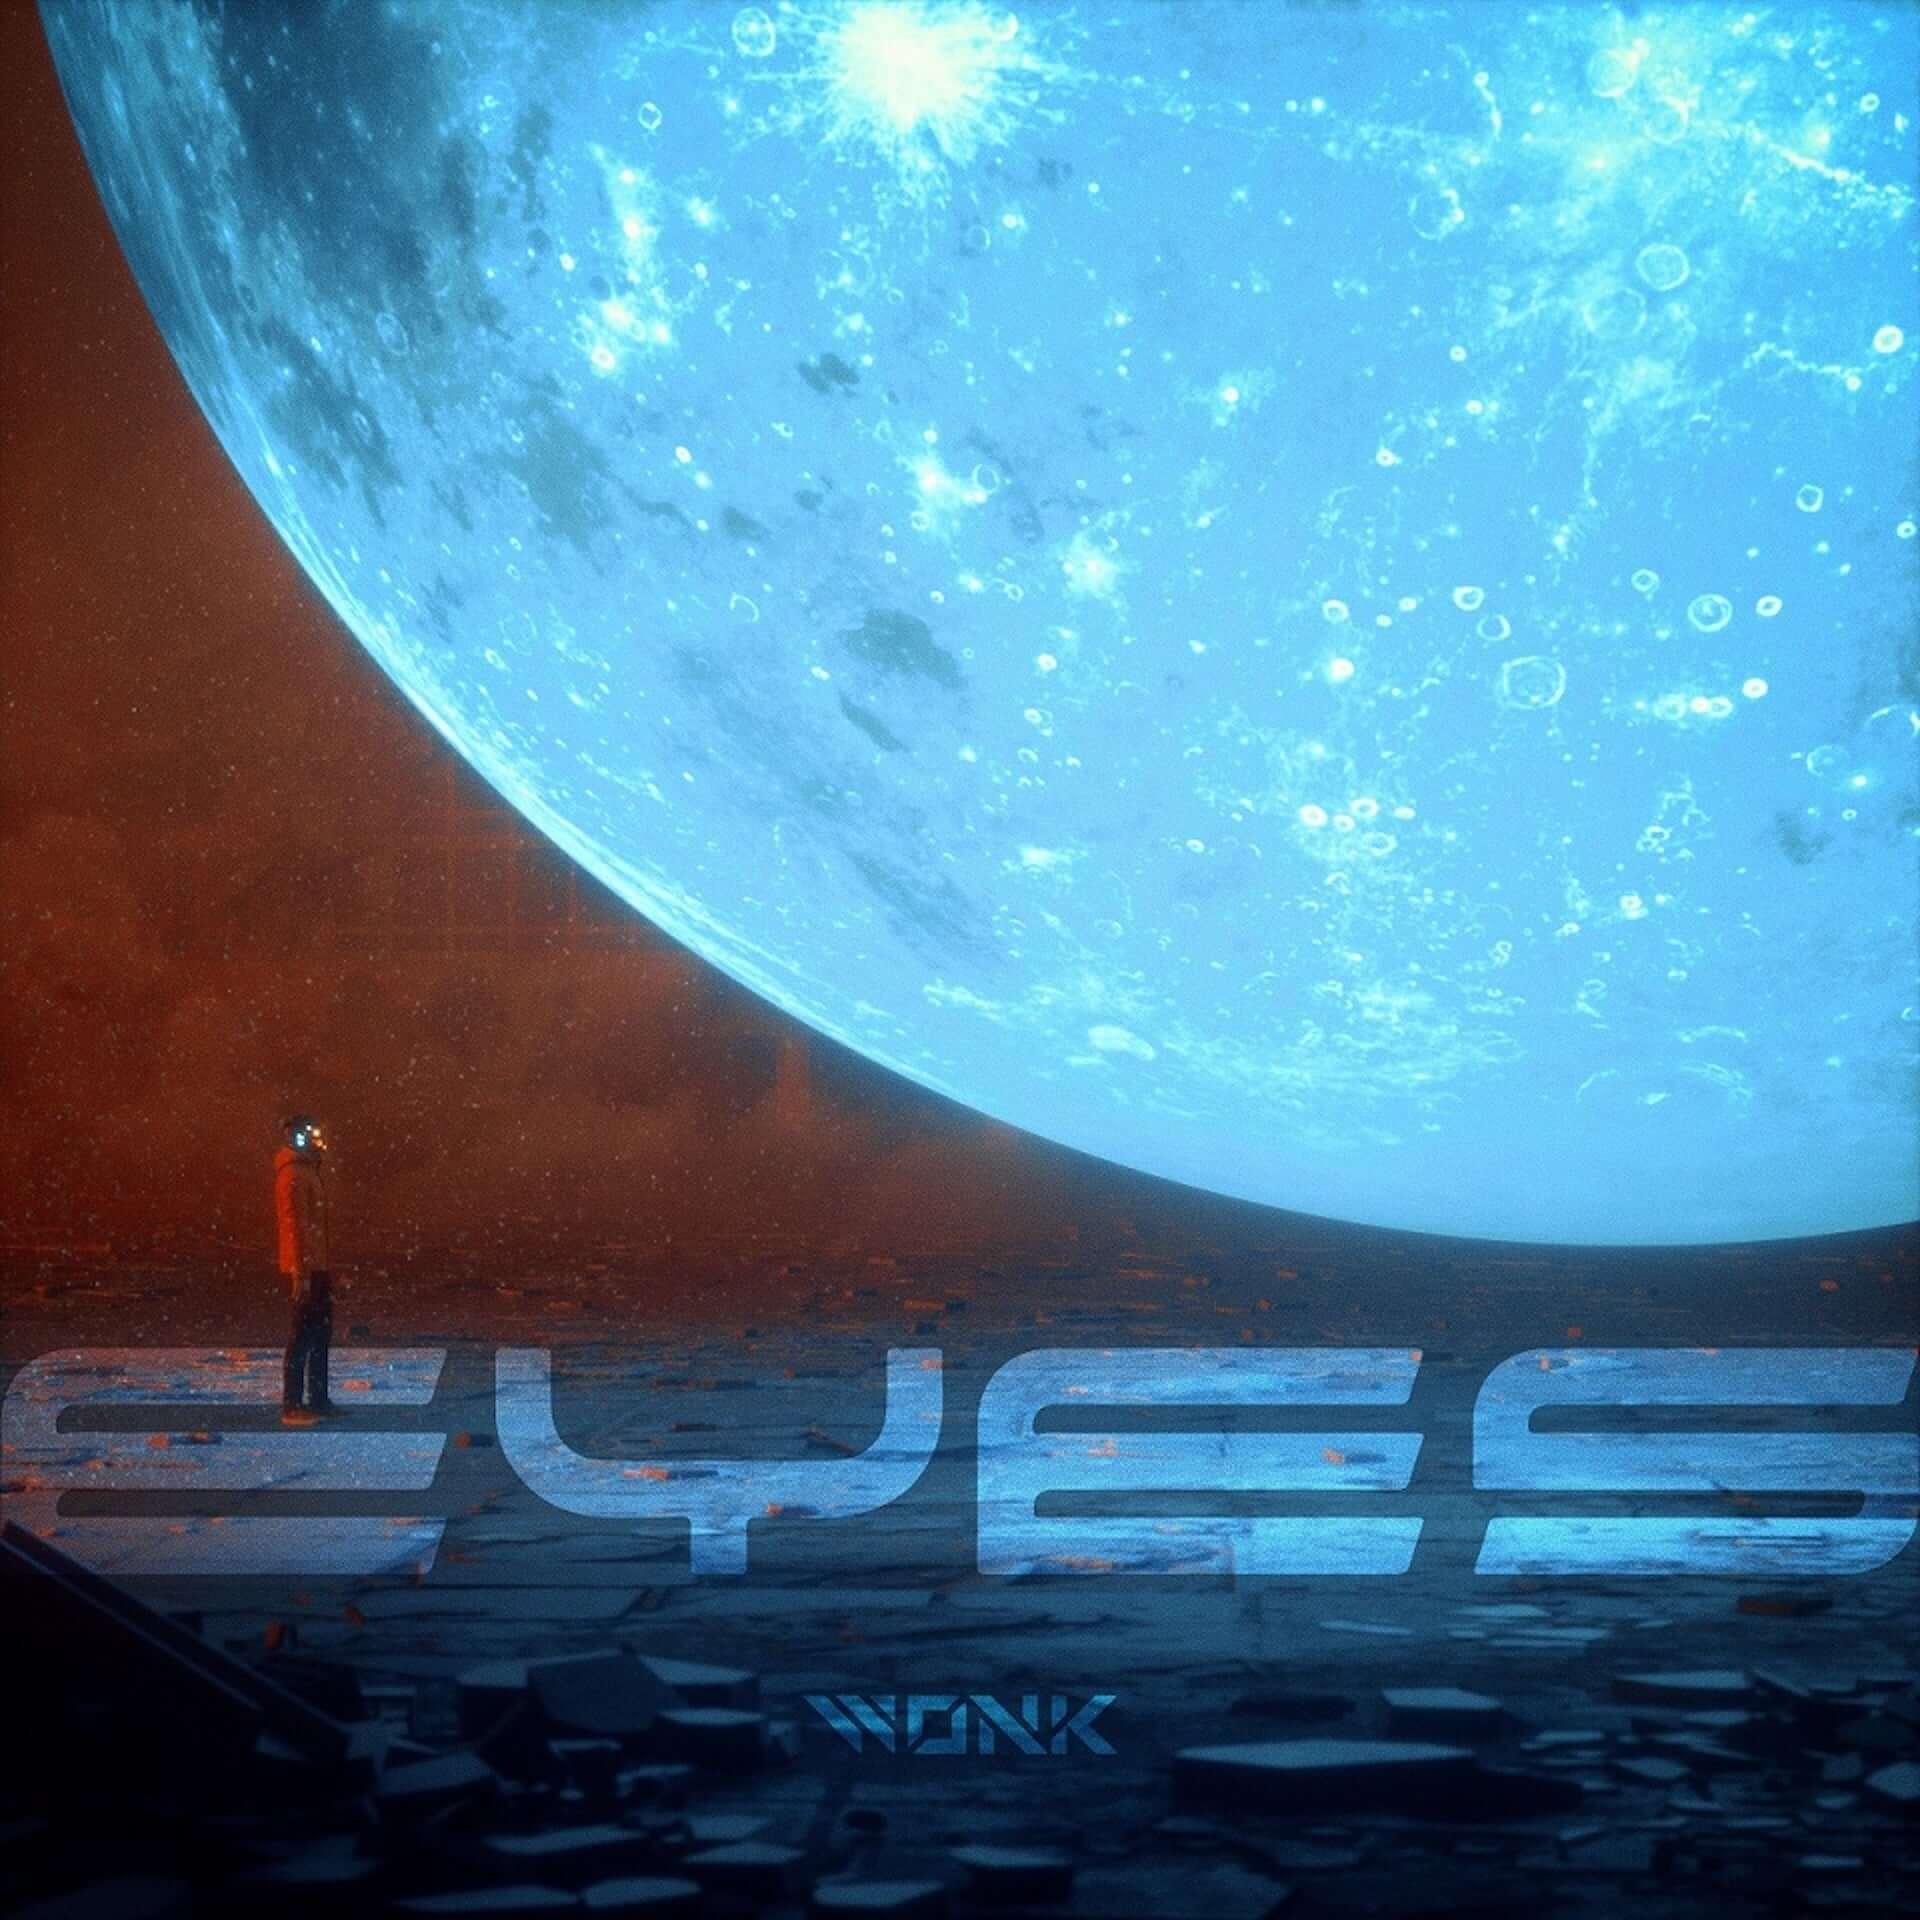 WONK最新作『EYES』の発売記念3DCGライブが映像作品に!バンド初のBlu-rayが発売決定&予約受付がスタート music201015_wonk_1-1920x1920